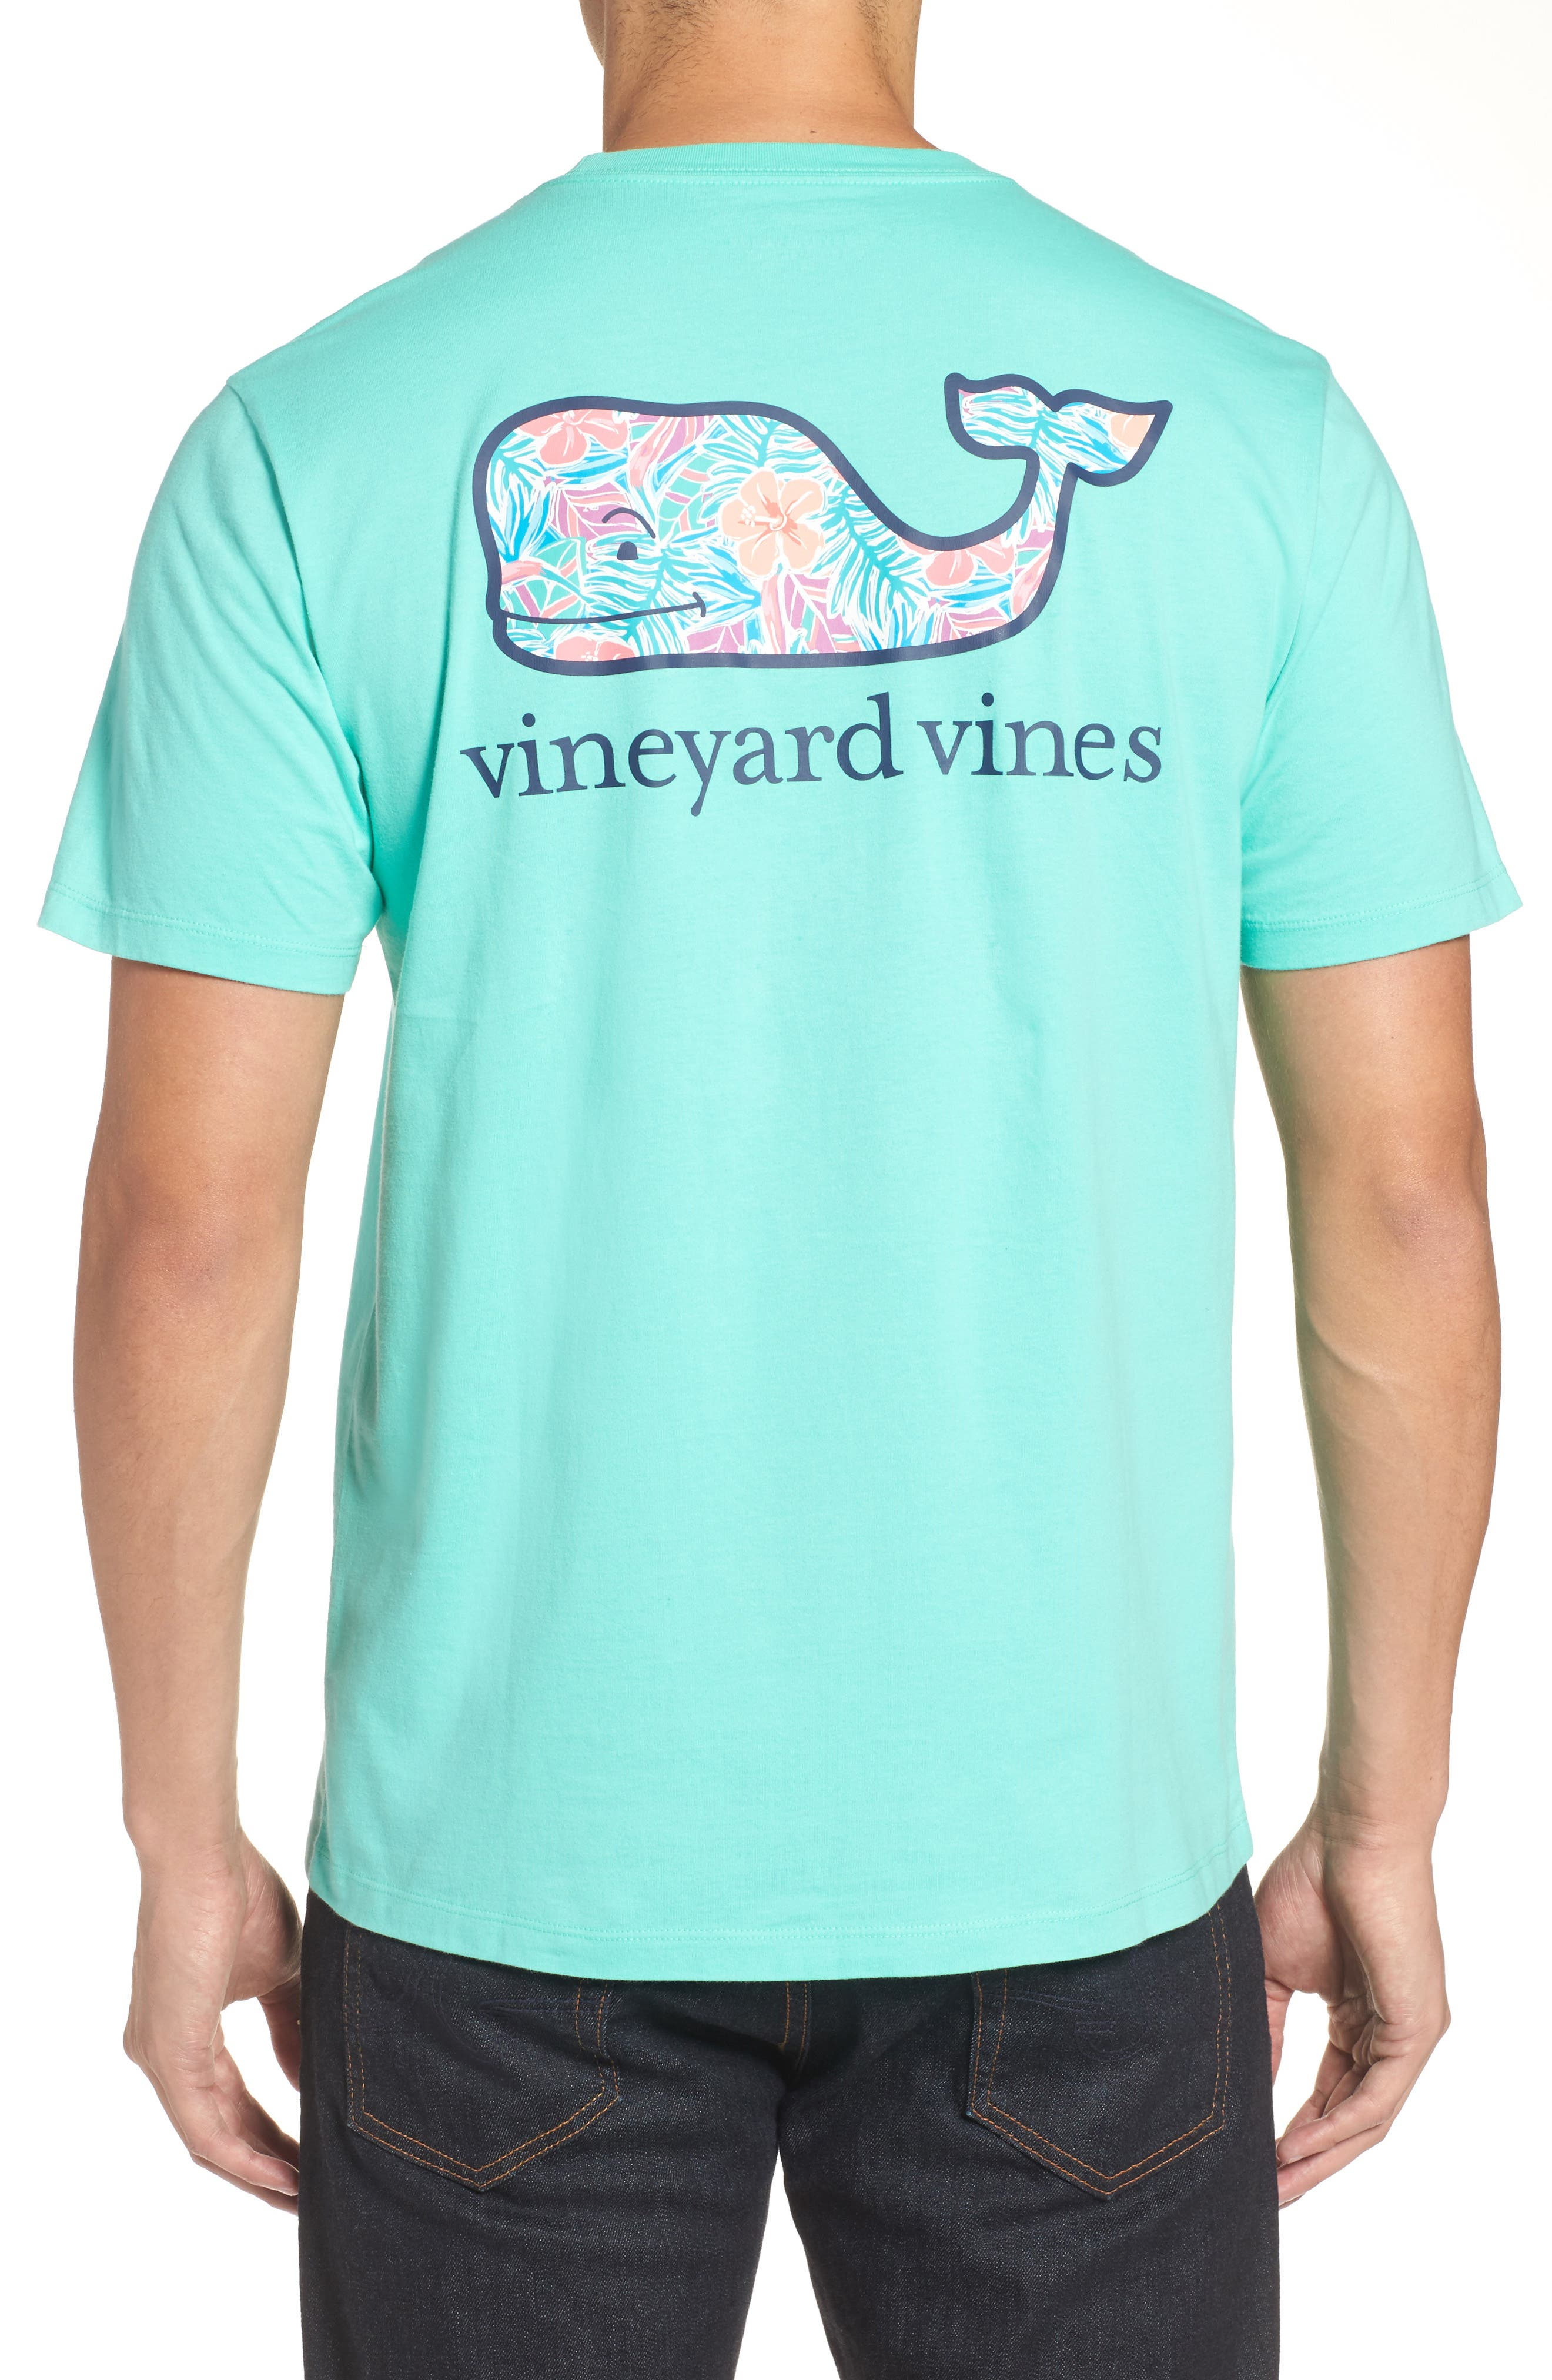 Main Image - vineyard vines Floral Whale Fill Pocket T-Shirt